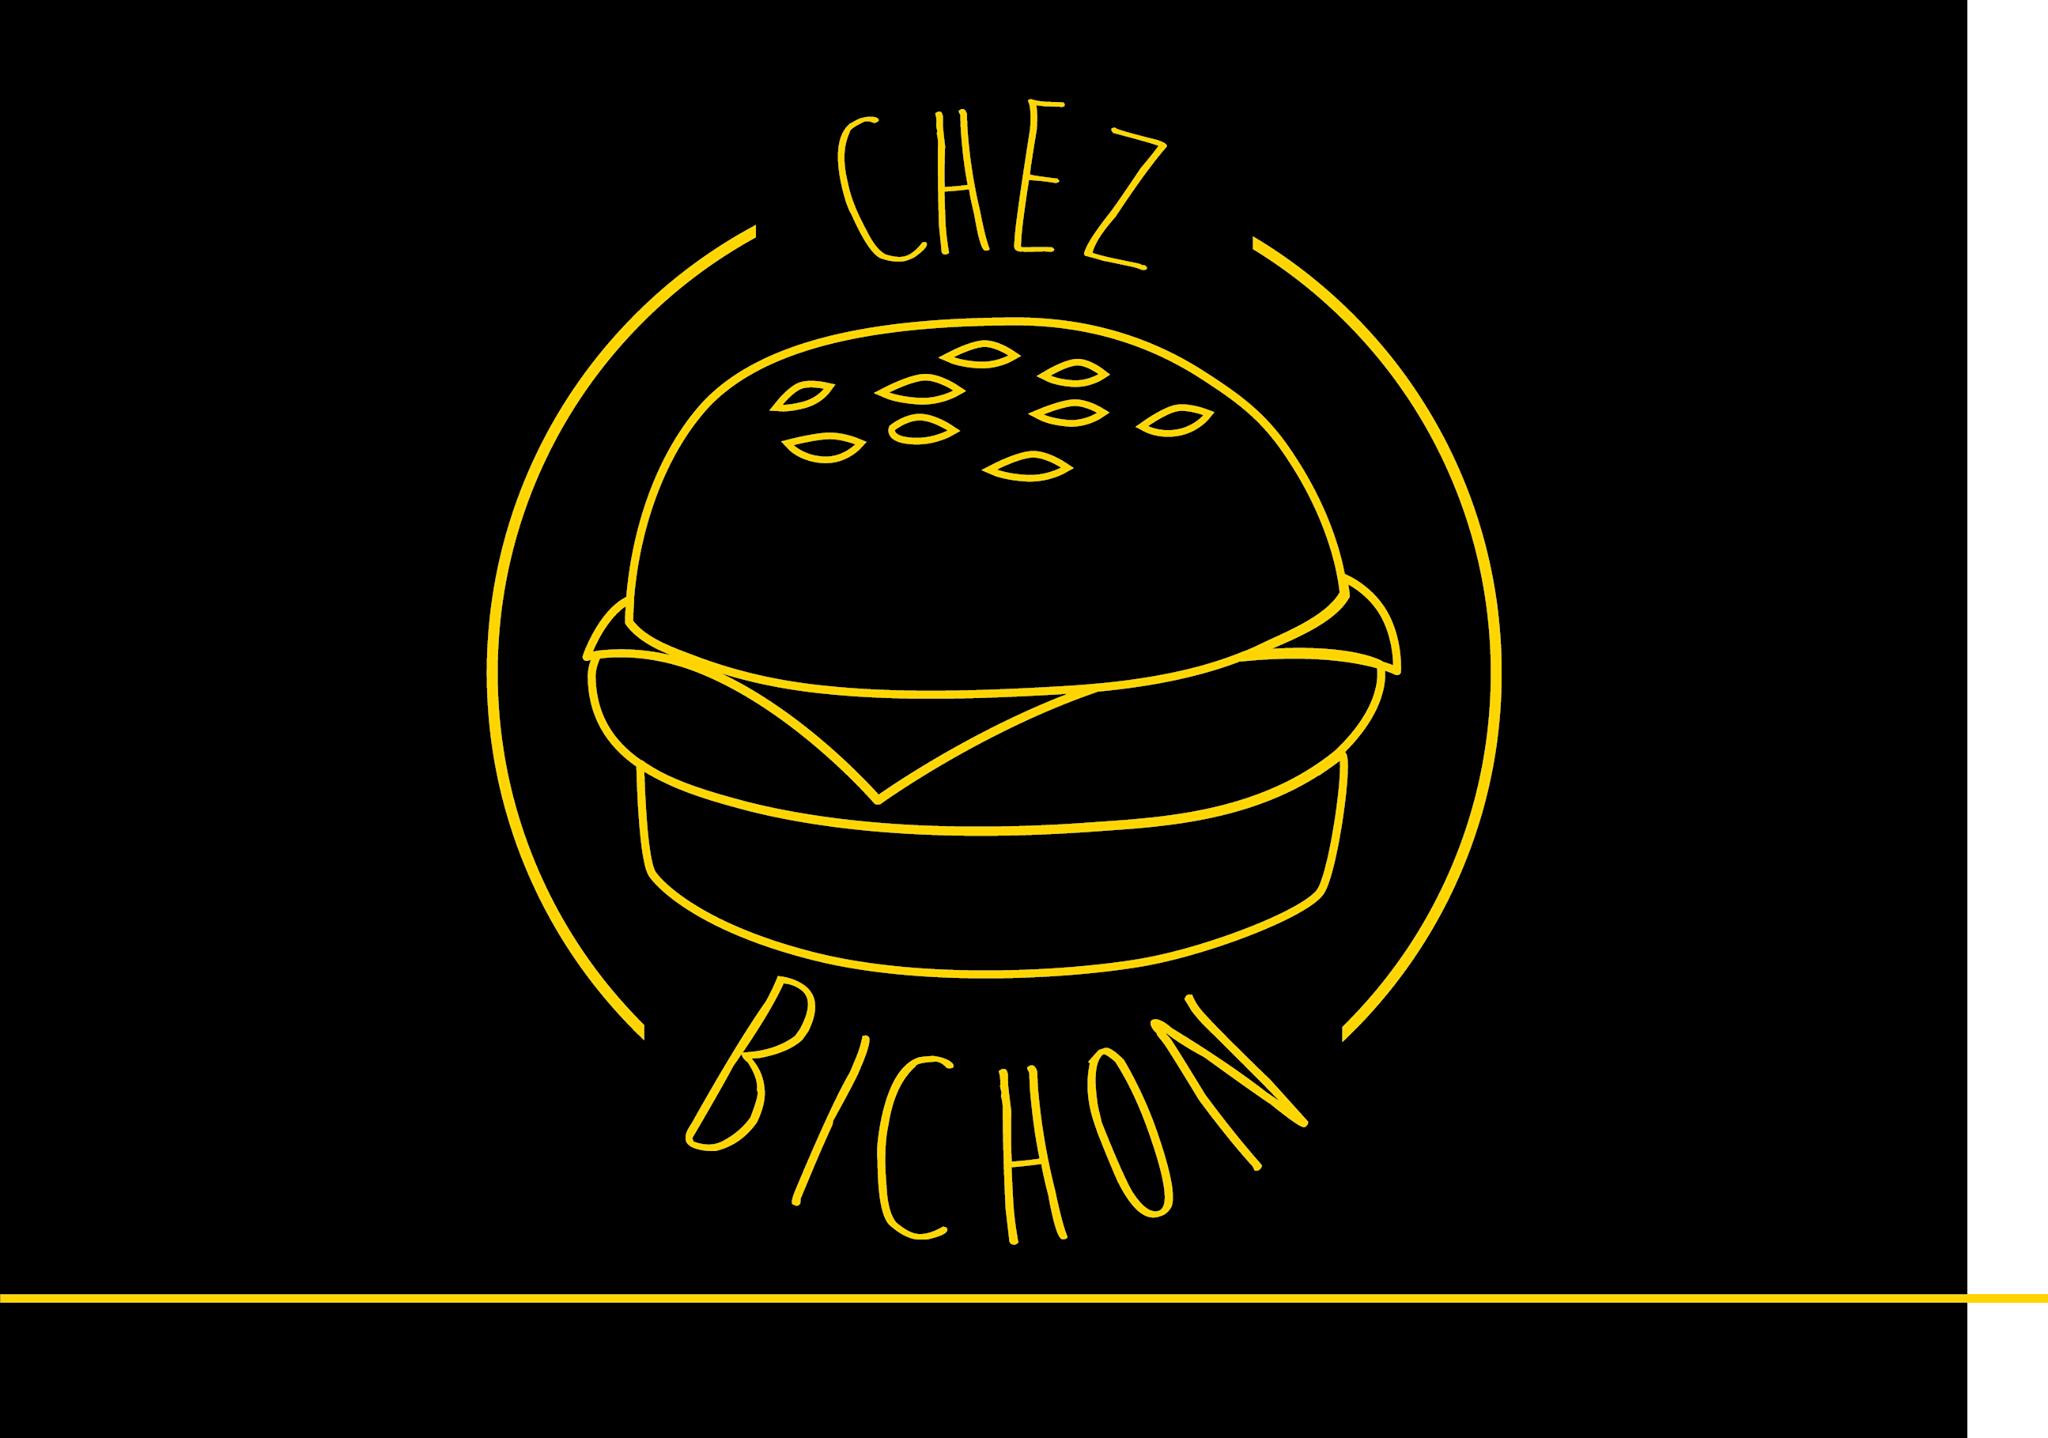 Logo Noir Jaune Chez Bichon